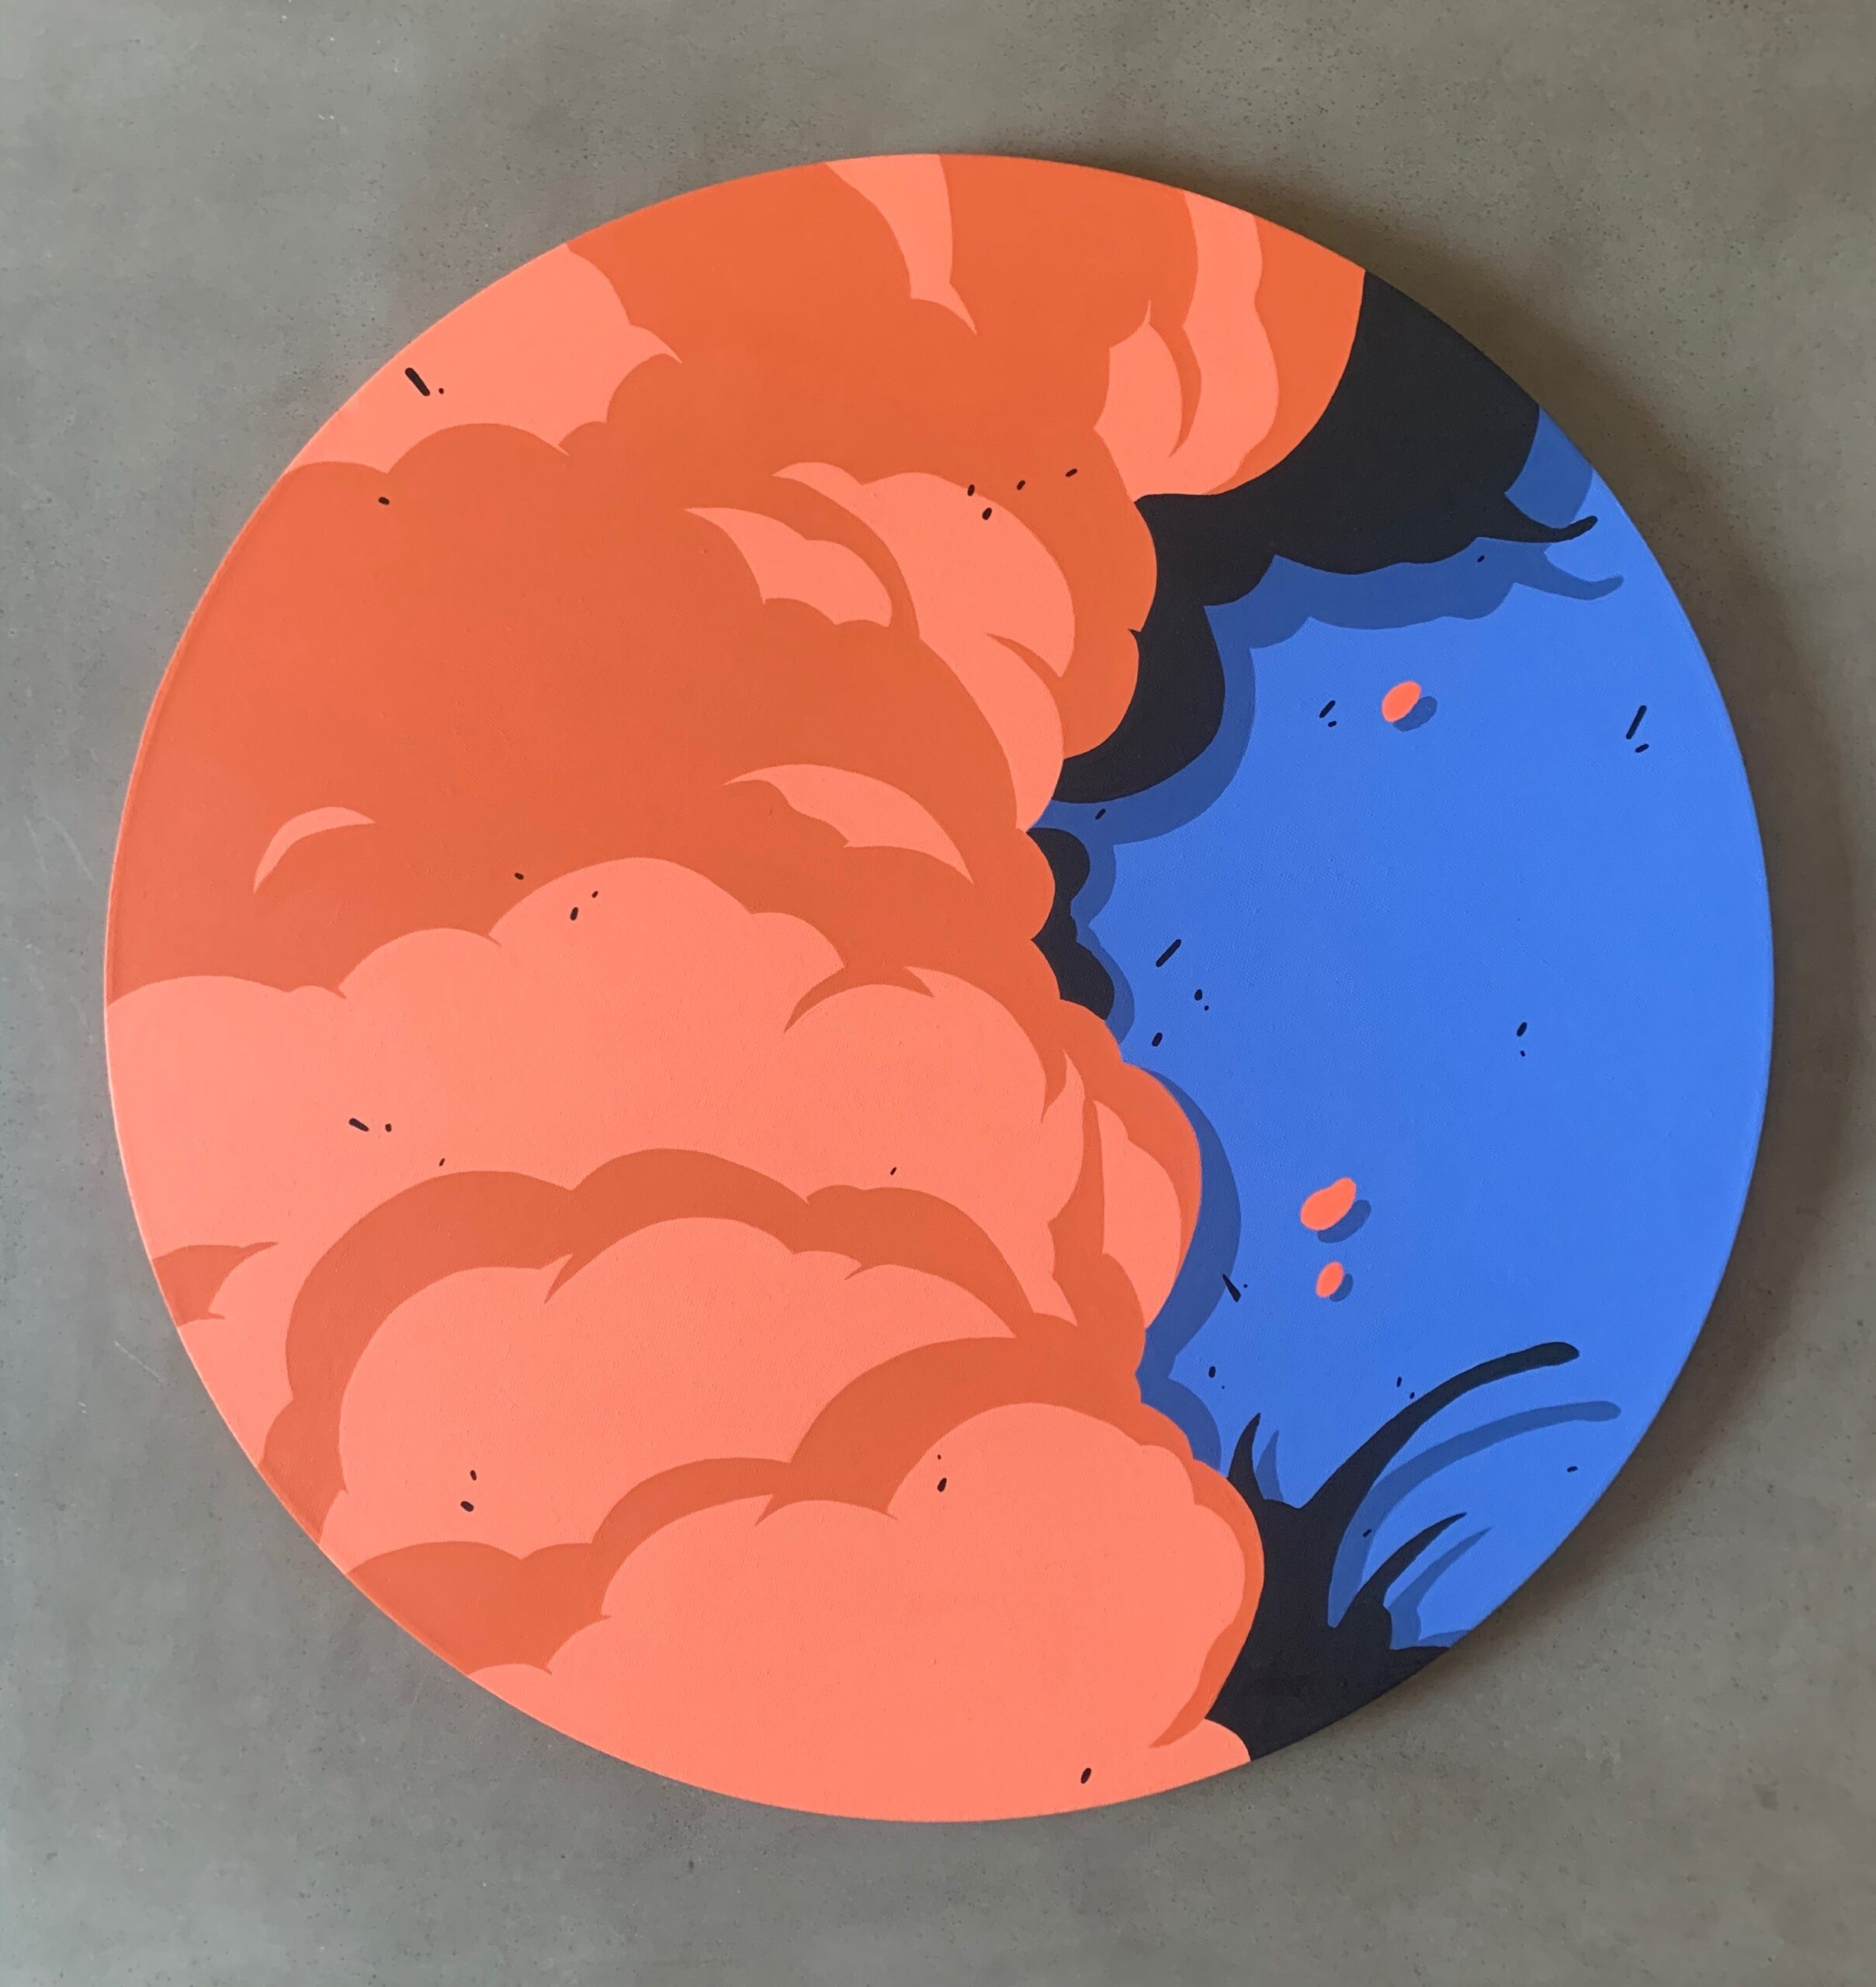 """Motion 2"" 24"" Round Canvas, Acrylic Paint. 2020."